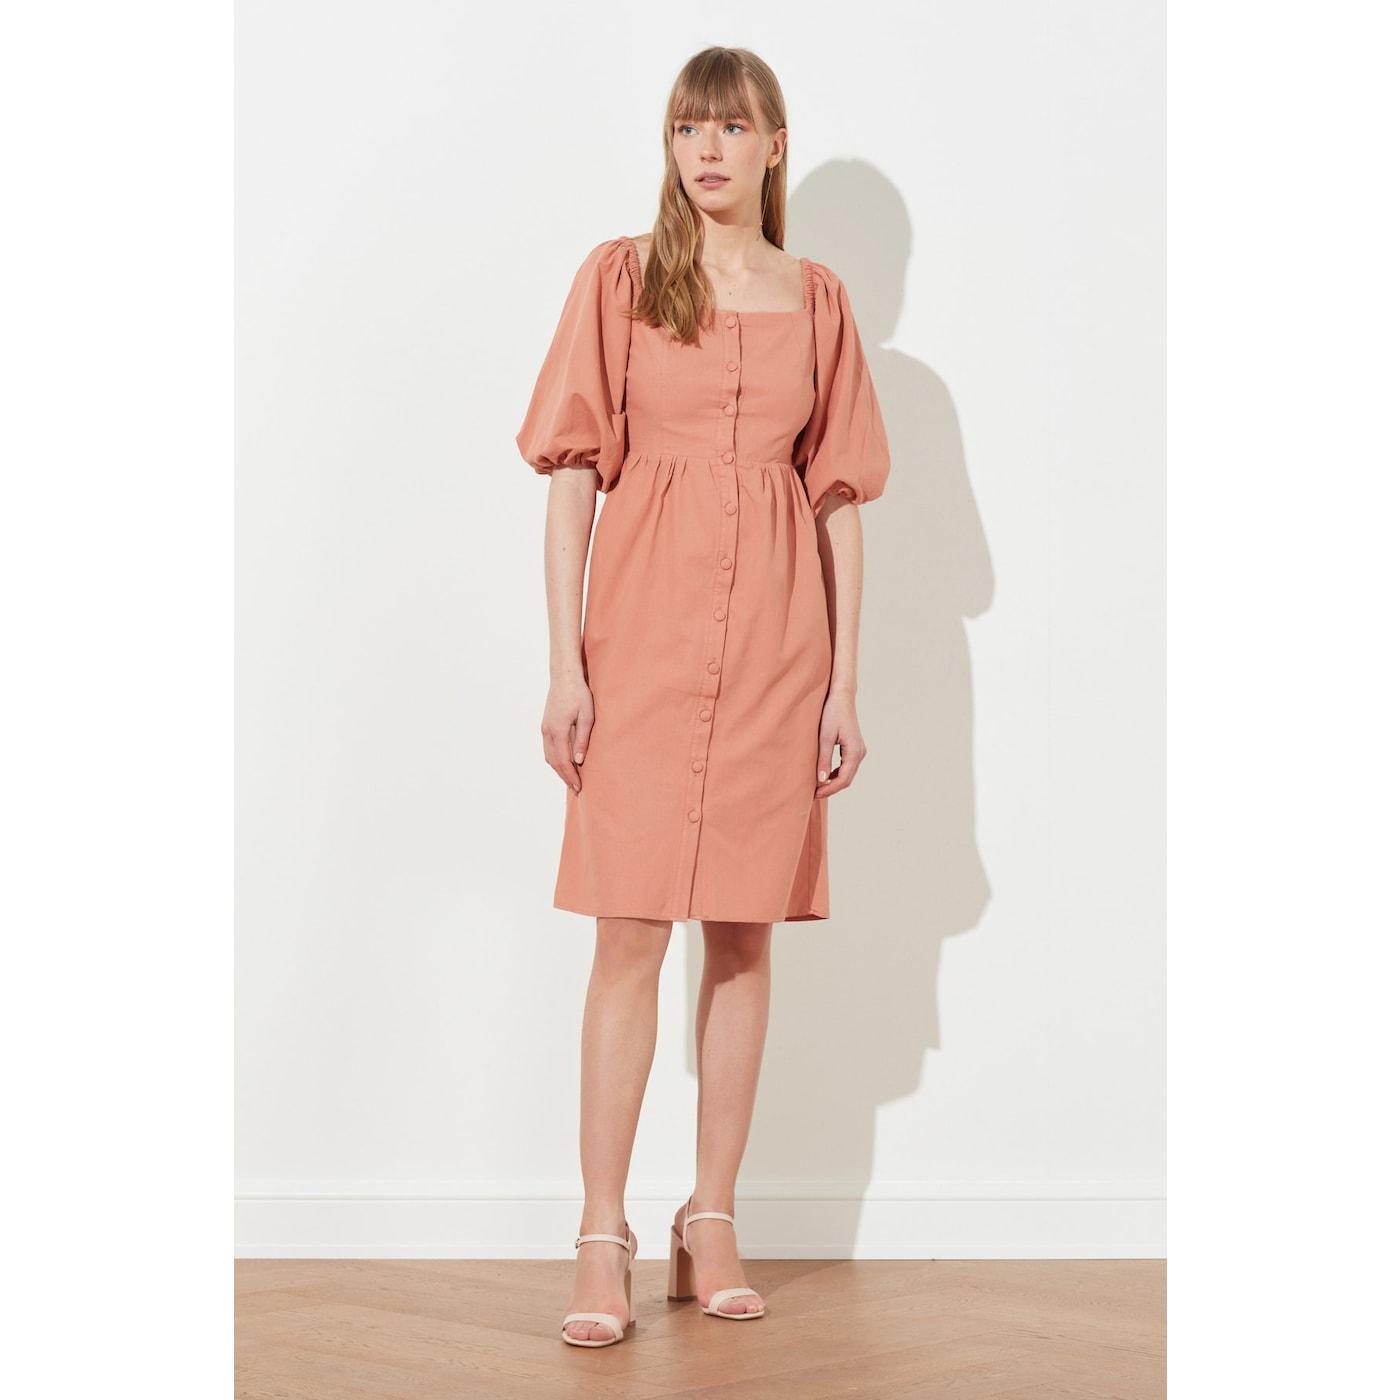 Trendyol Rose Dry Square Collar Buttoned Dress dámské 40